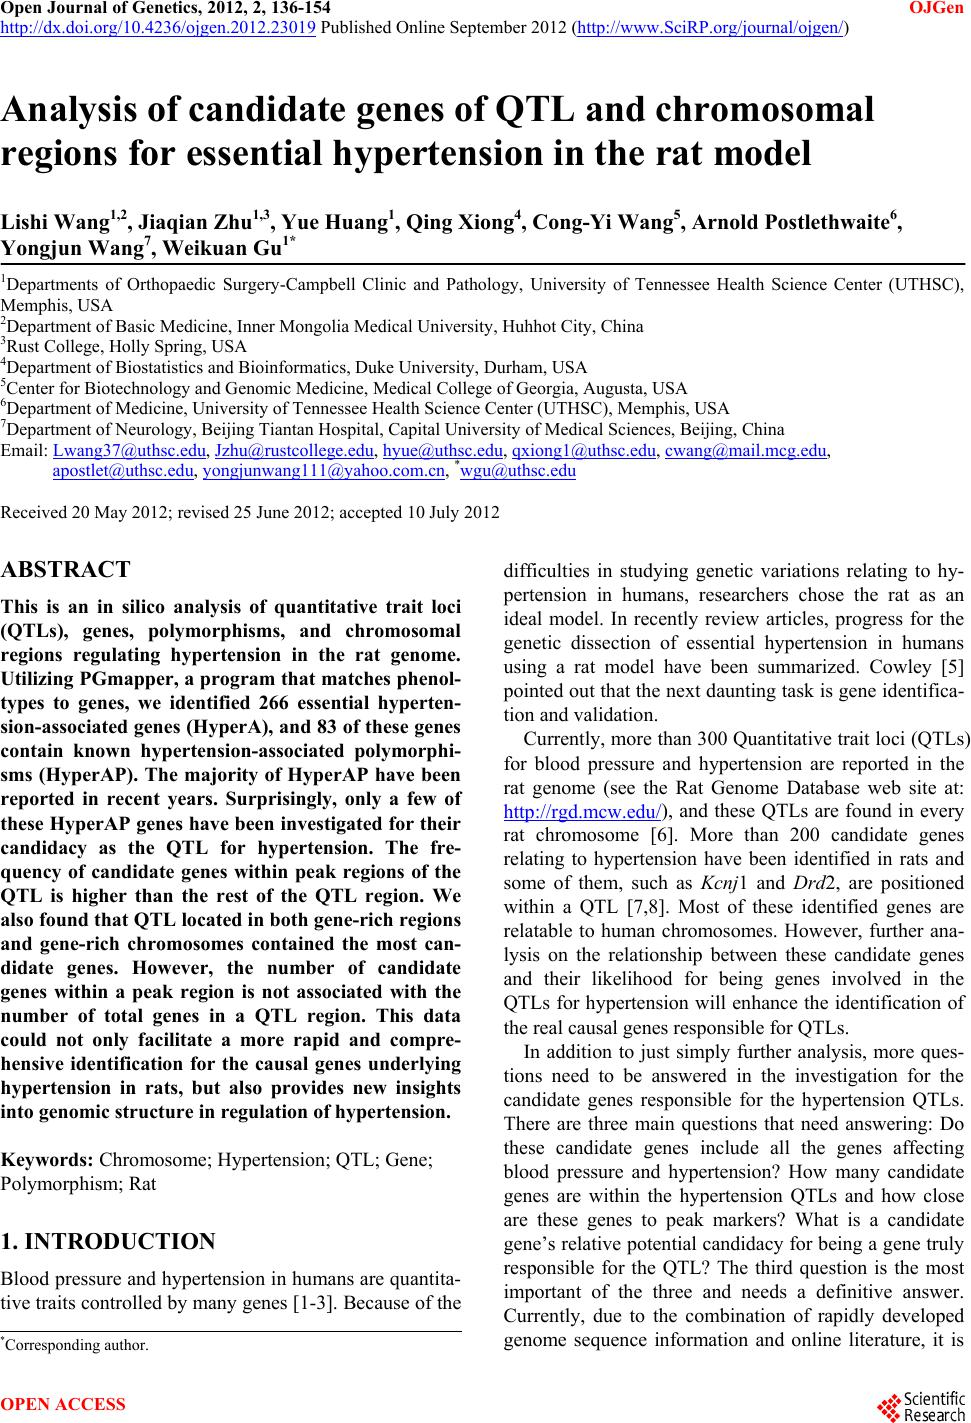 study on essential hypertension